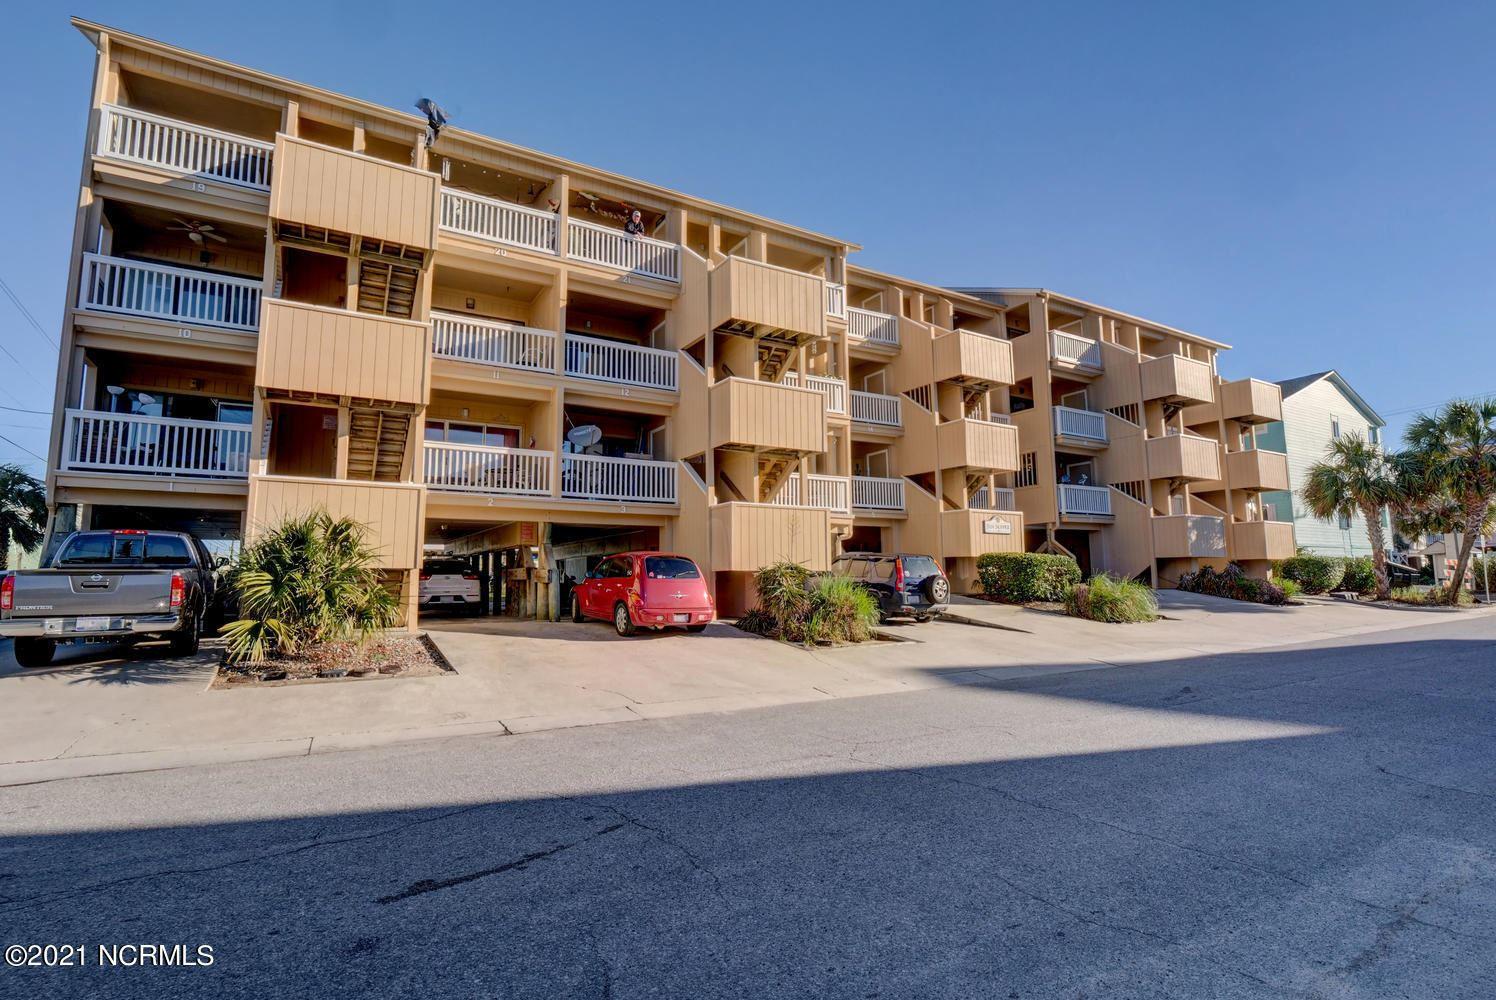 Photo for 1600 Canal Drive #A19, Carolina Beach, NC 28428 (MLS # 100281108)